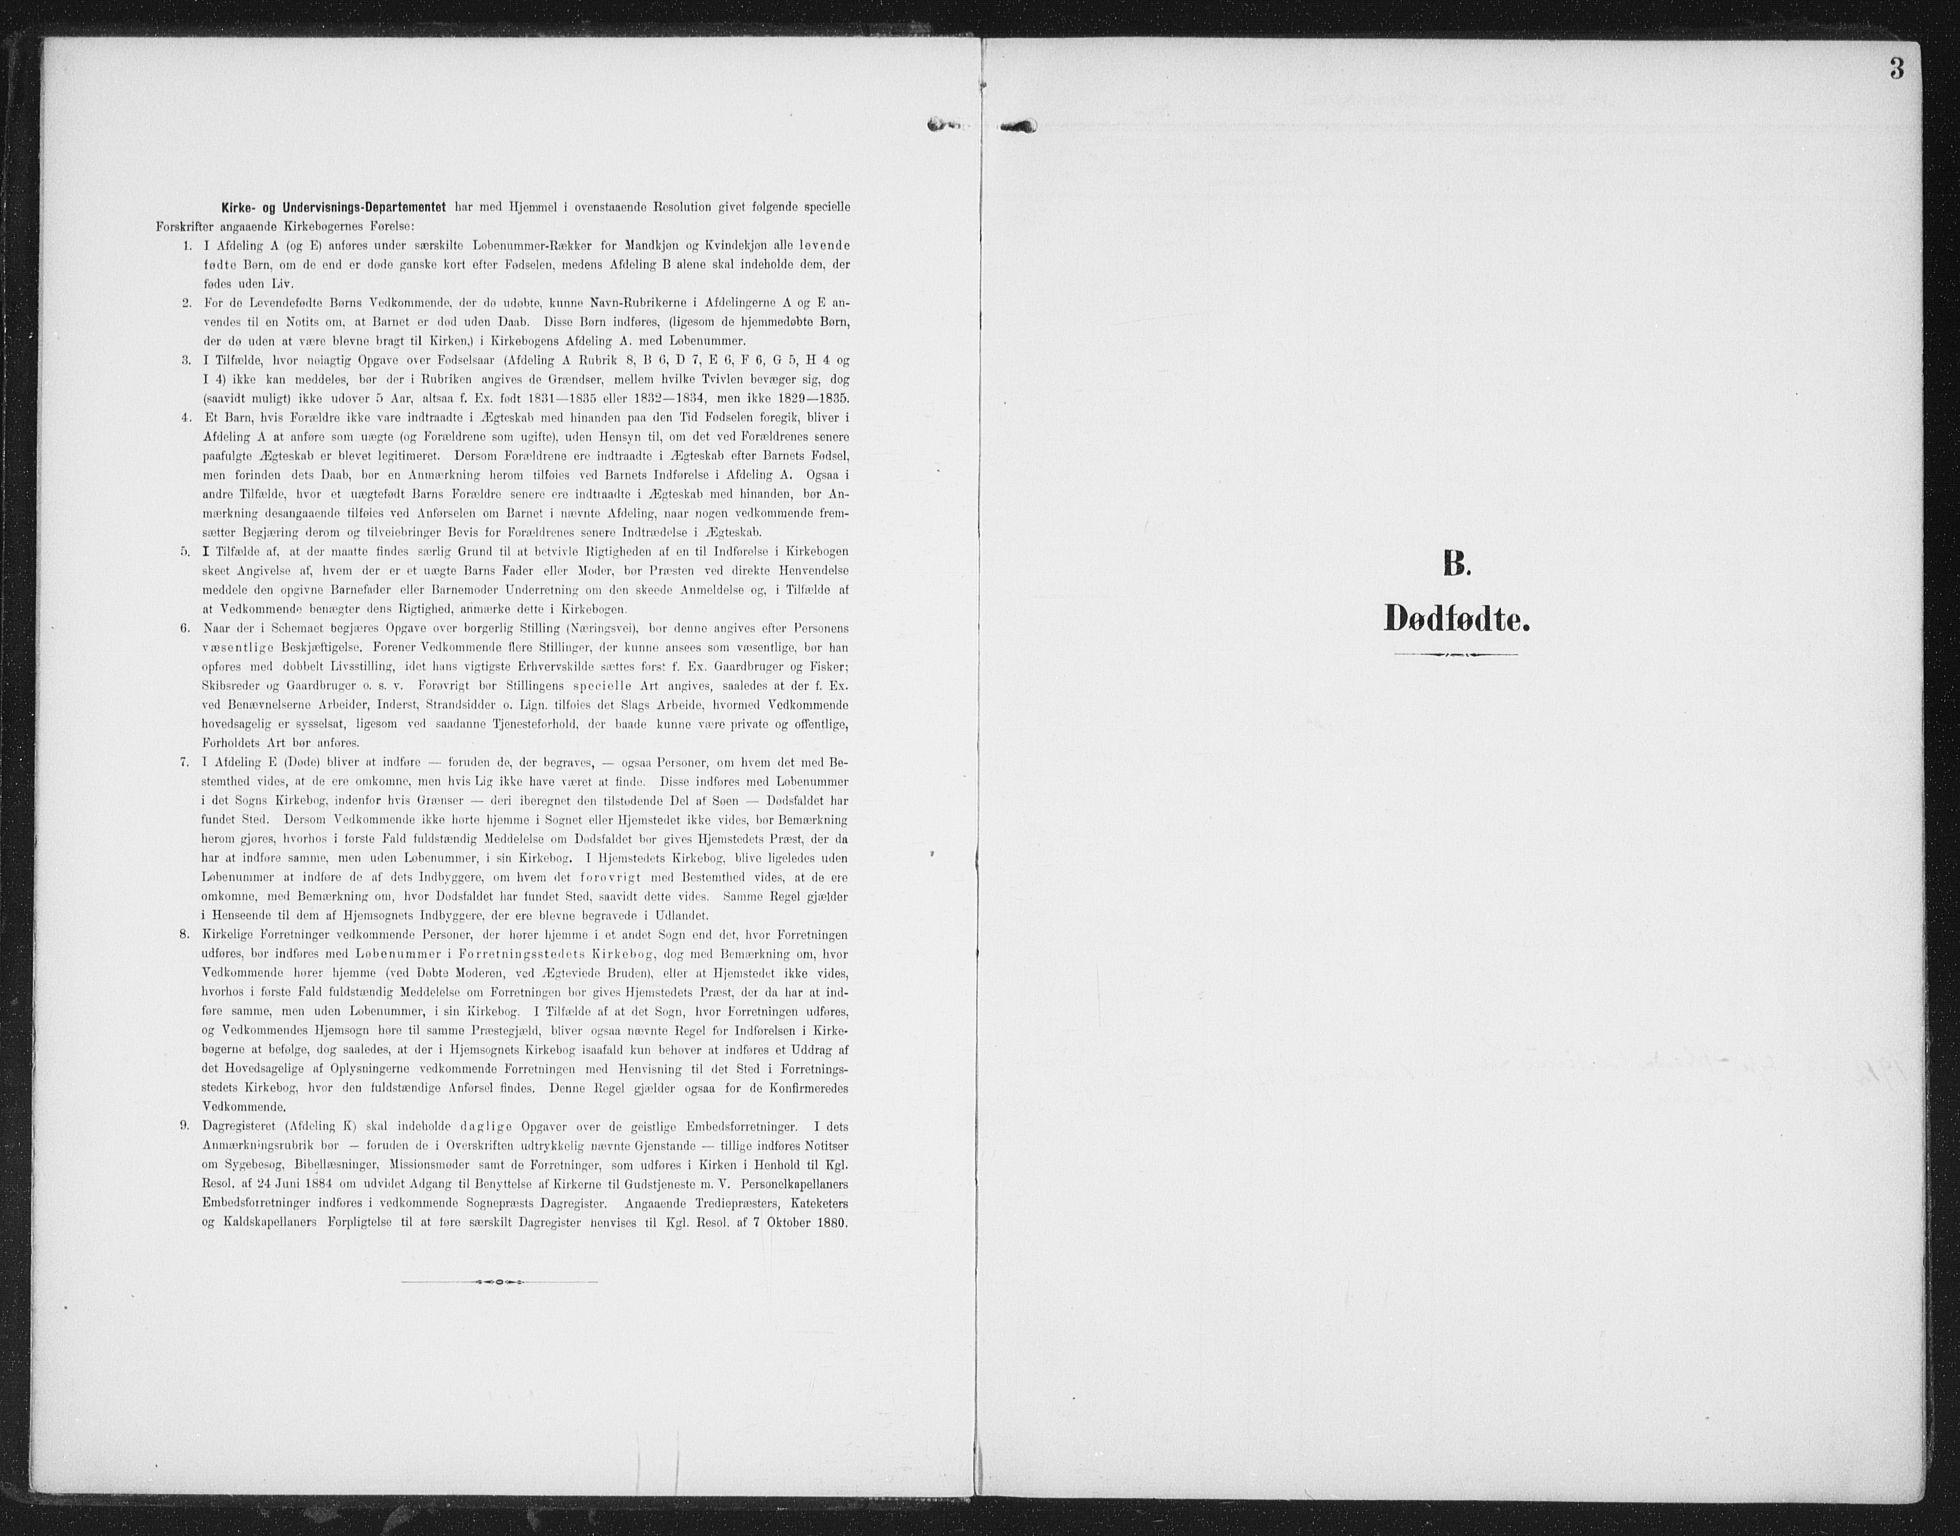 SAT, Ministerialprotokoller, klokkerbøker og fødselsregistre - Nordland, 827/L0403: Ministerialbok nr. 827A15, 1903-1912, s. 3